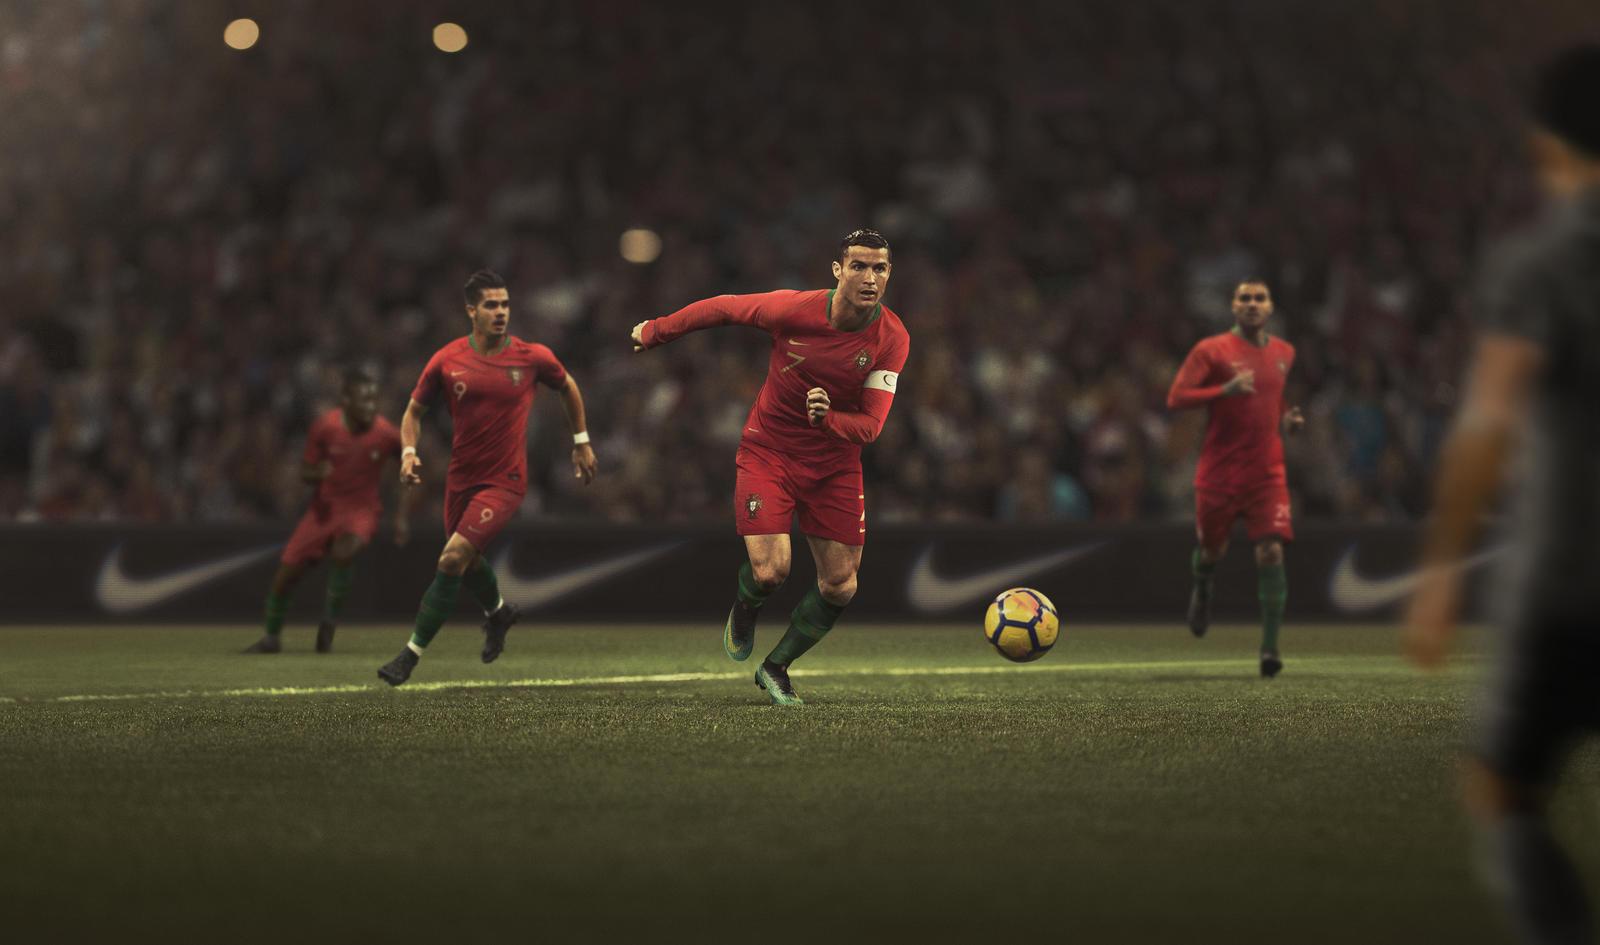 Cristiano Ronaldo CR7 Chapter 6: Born Leader Mercurial Superfly 360 - Nike News